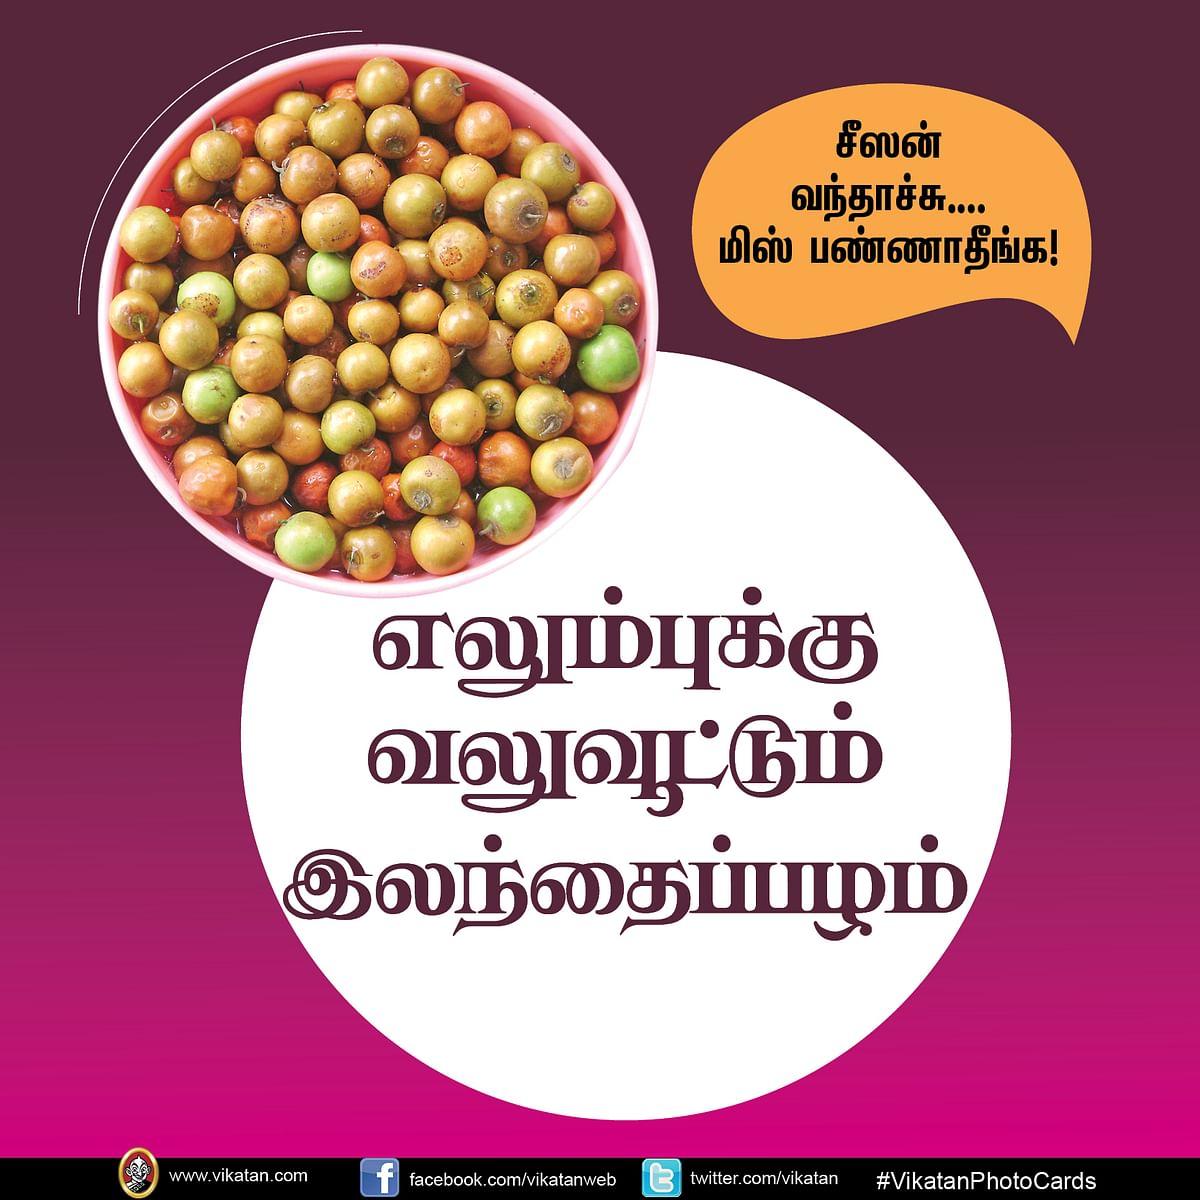 Benefits of Jujube fruit